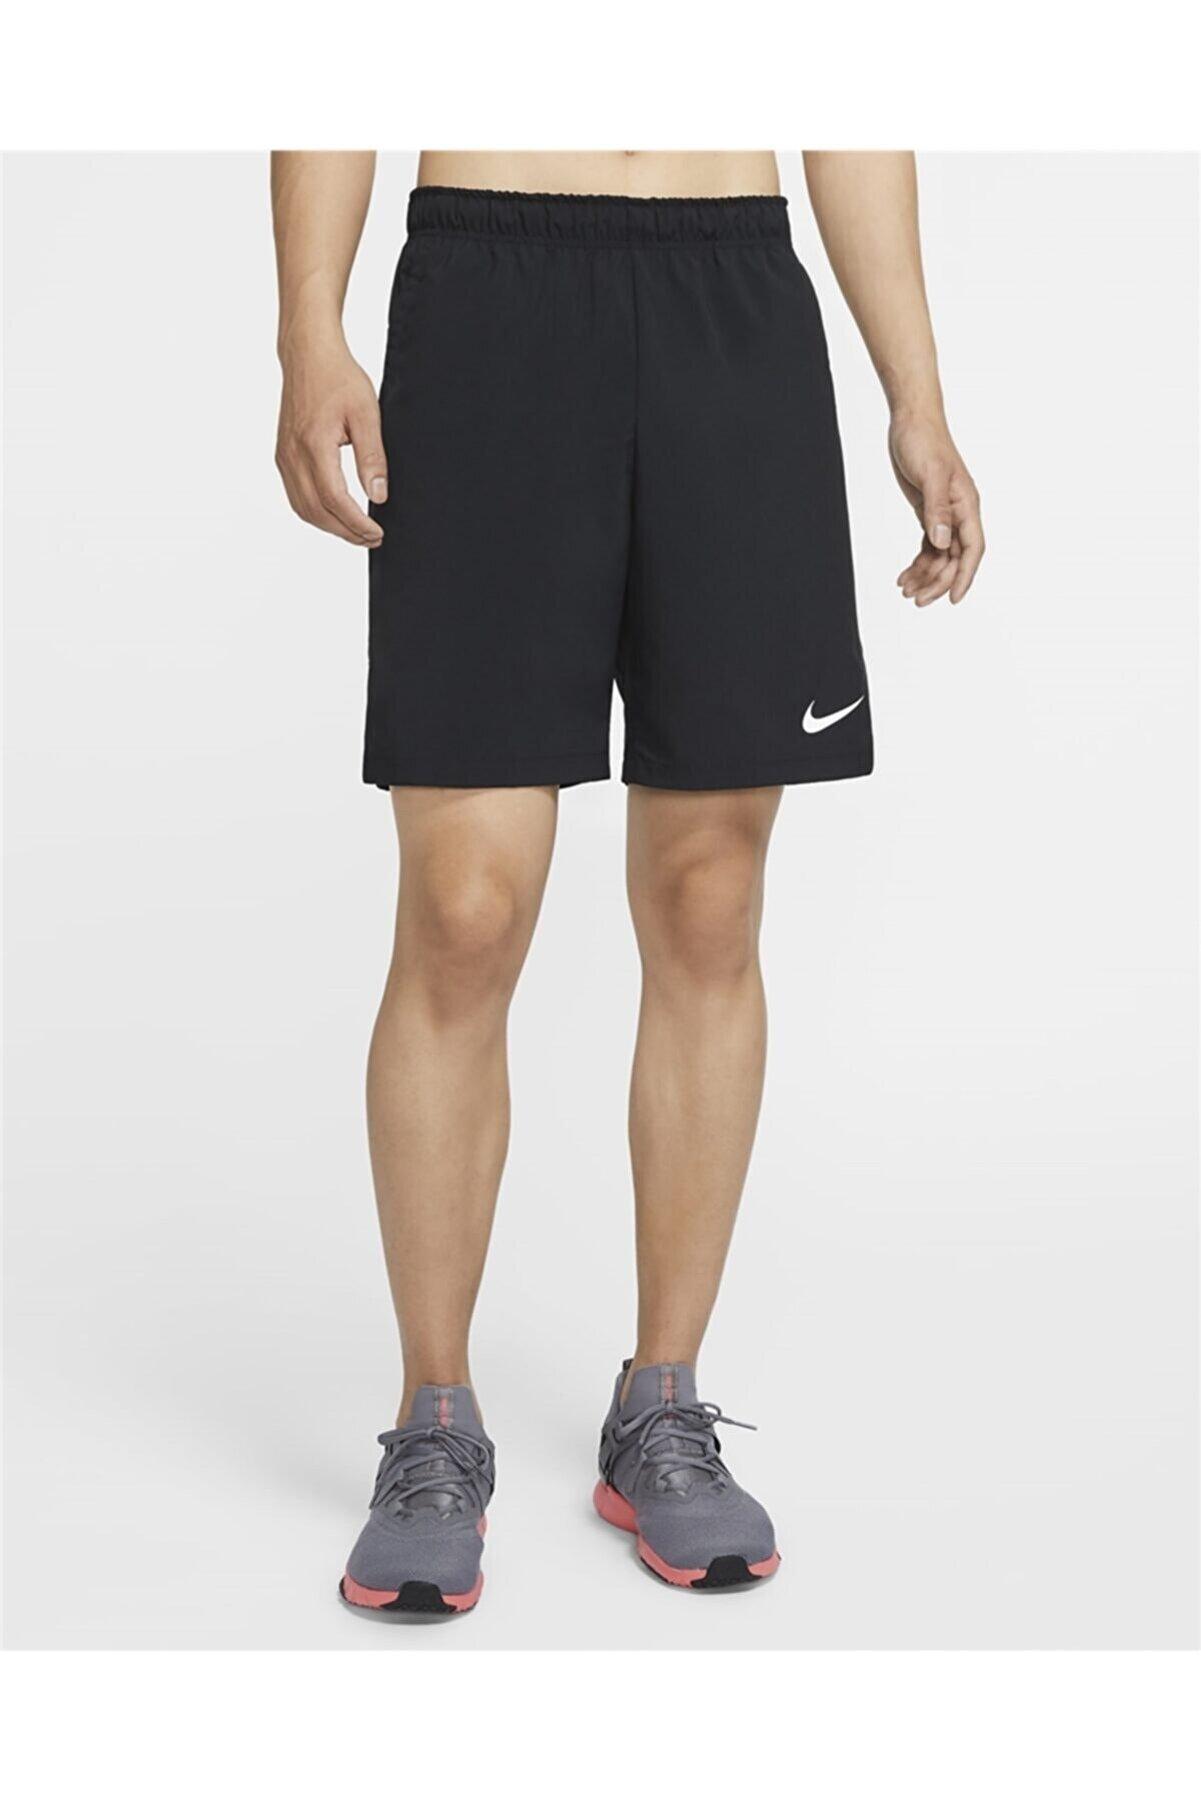 Nike Erkek Siyah  Spor Şort